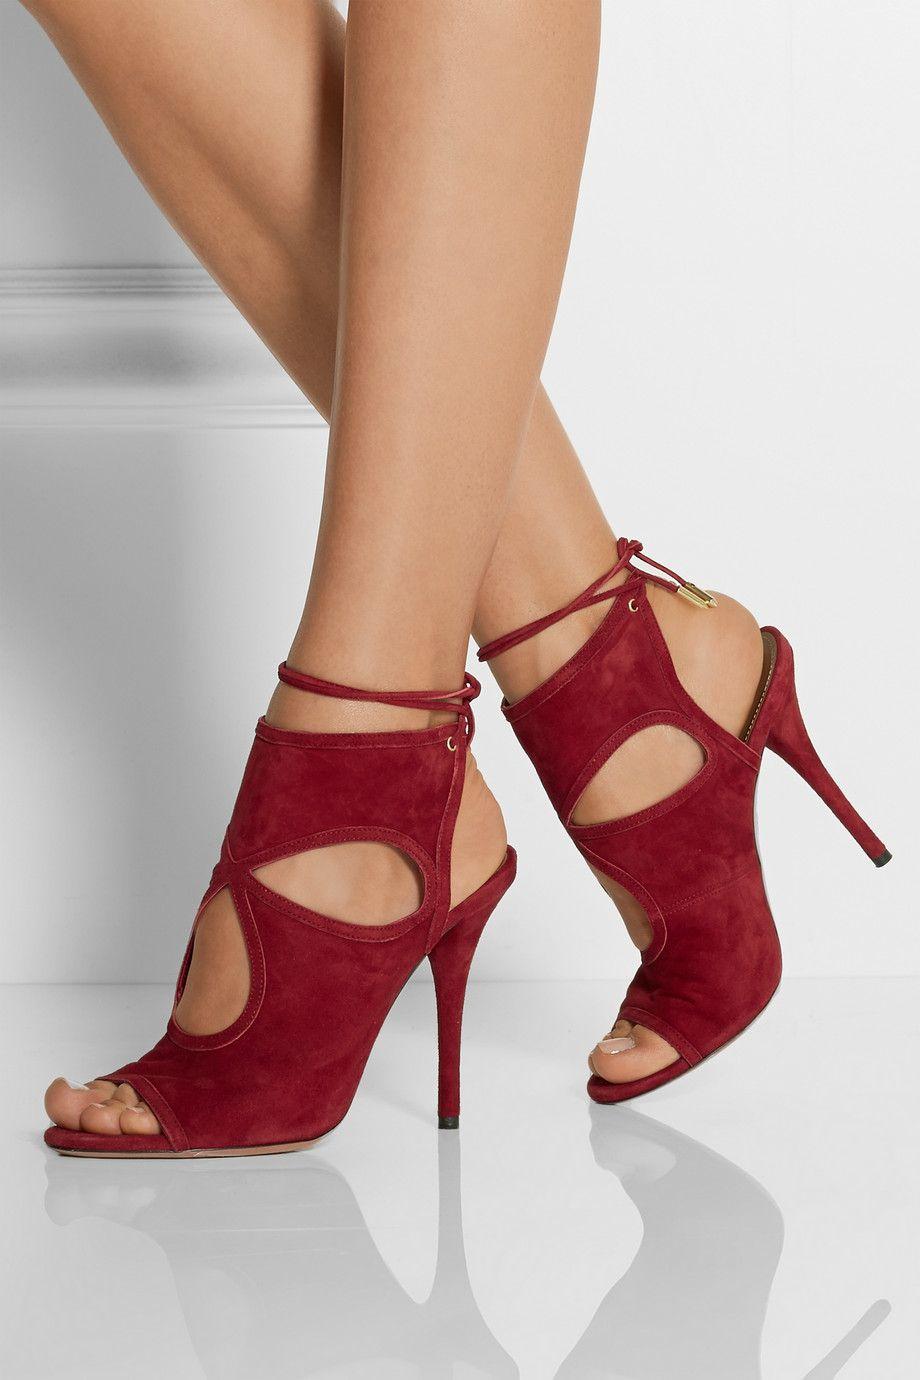 Womens Boots High-Quality Cheap 63172889 Aquazzura Sexy Thing Suede Cutout